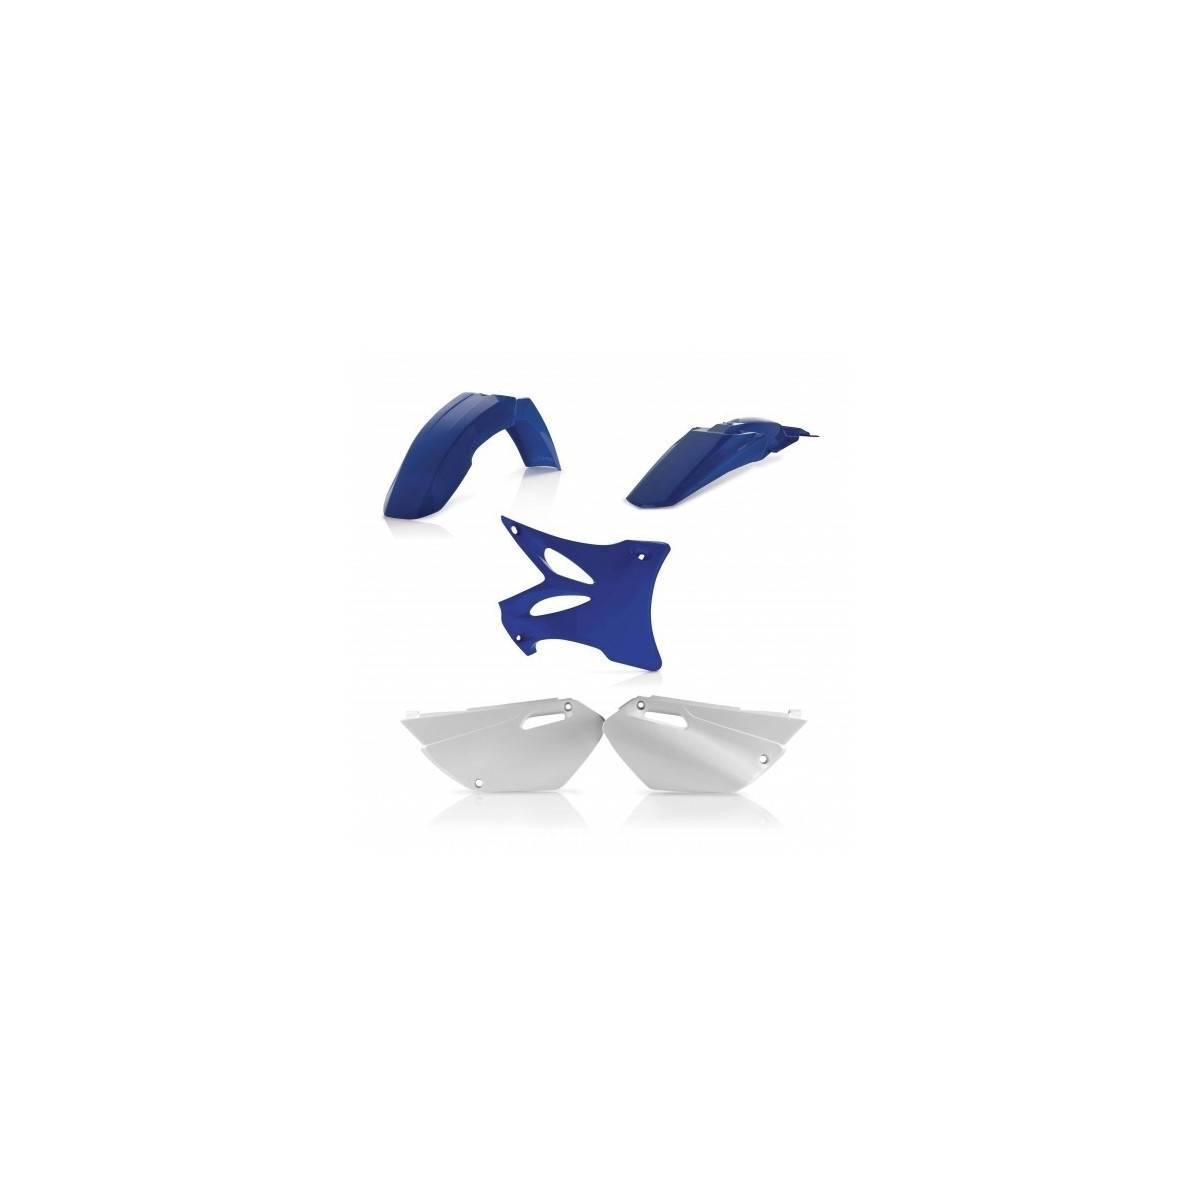 0017903-553 - Kit Plasticos Yz 85 15 17 Origen